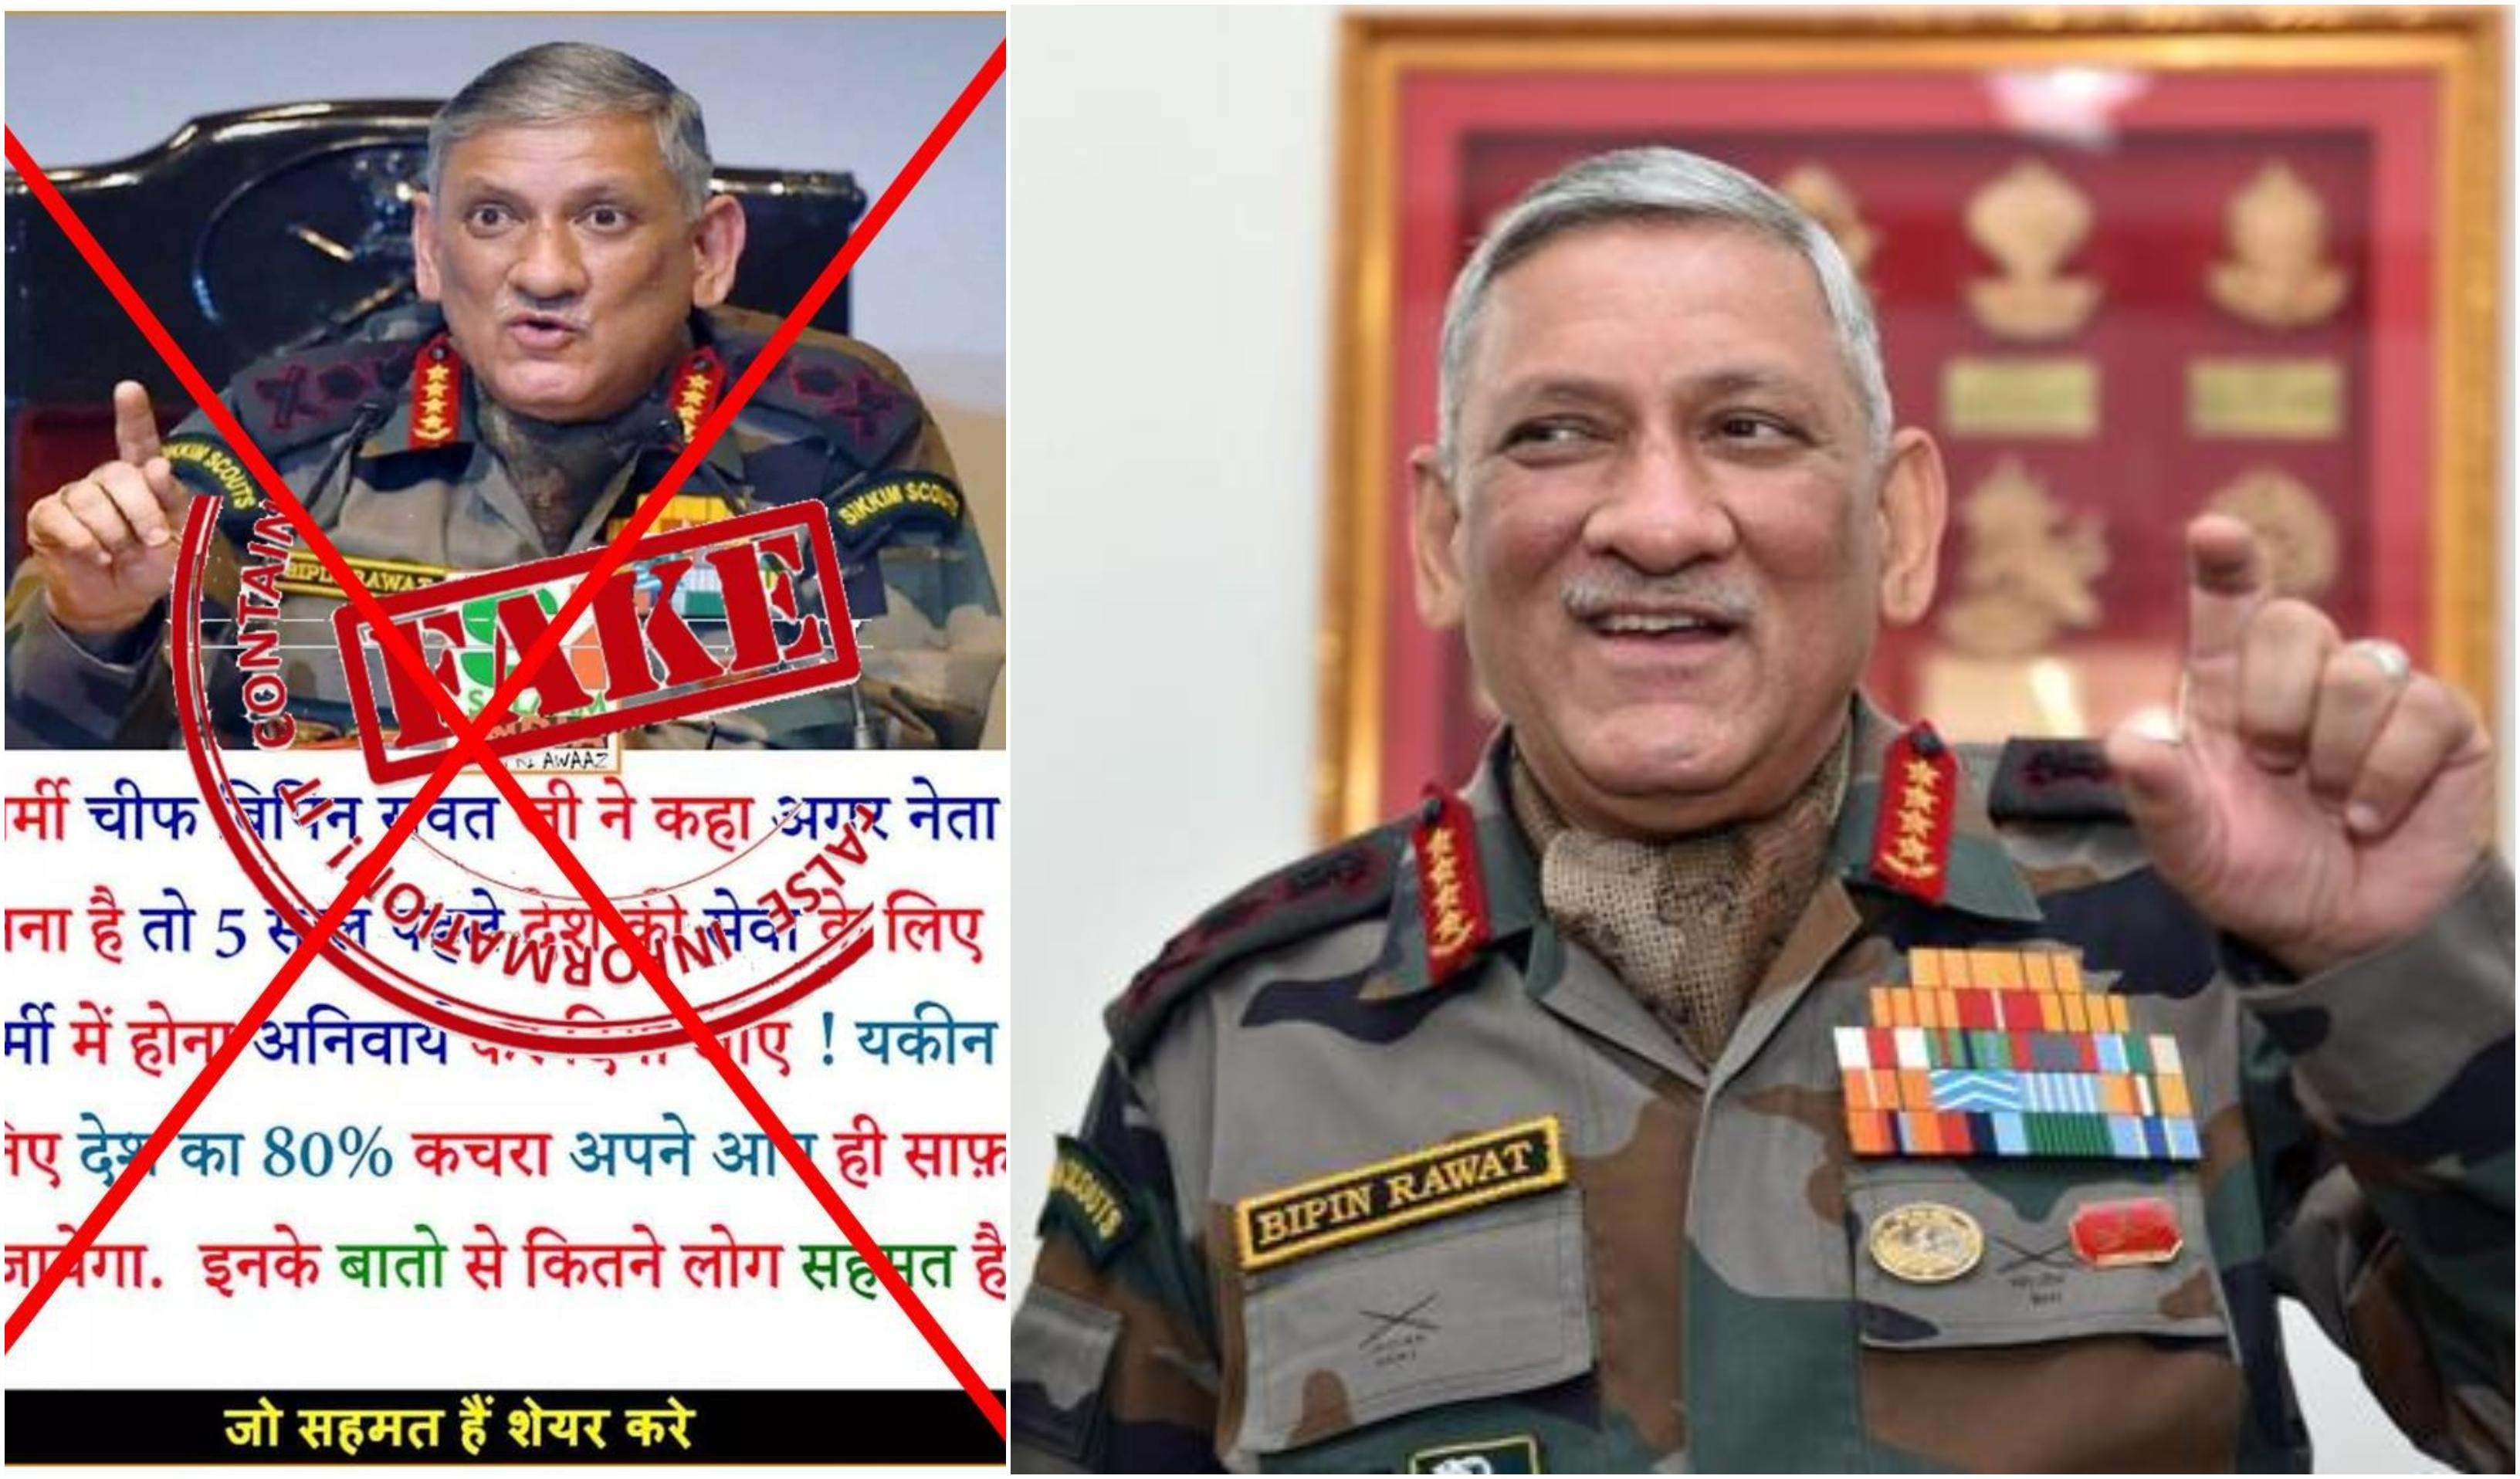 Fake News, Fake, Post, Facebook, Army Chief, General, Bipin Rawat, Indian Army, NewsMobile, Mobile News, Fact Check, Fact Checker, India